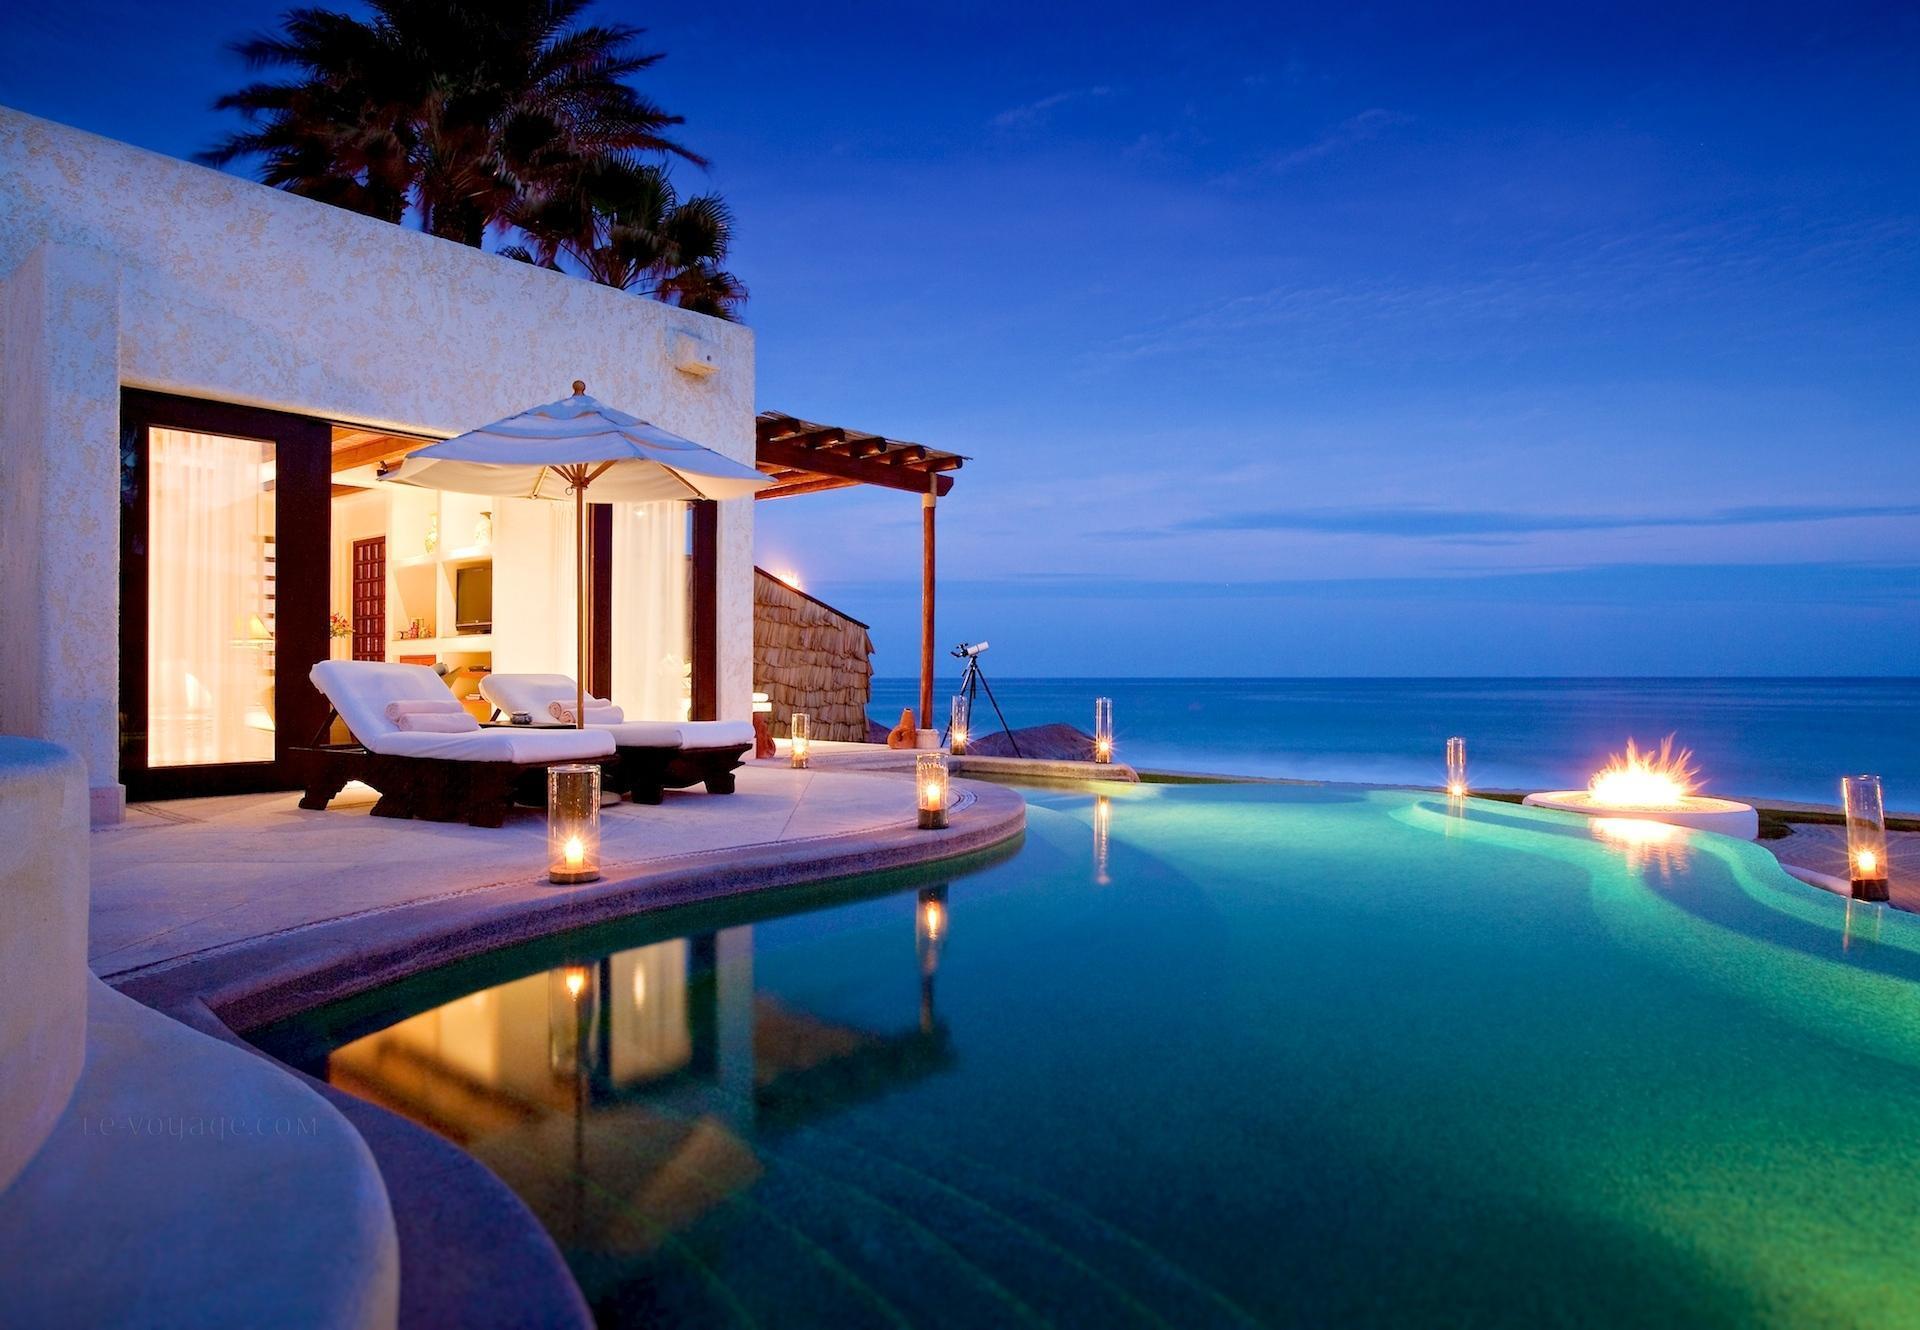 Beautifully lit pool at night hd desktop wallpaper